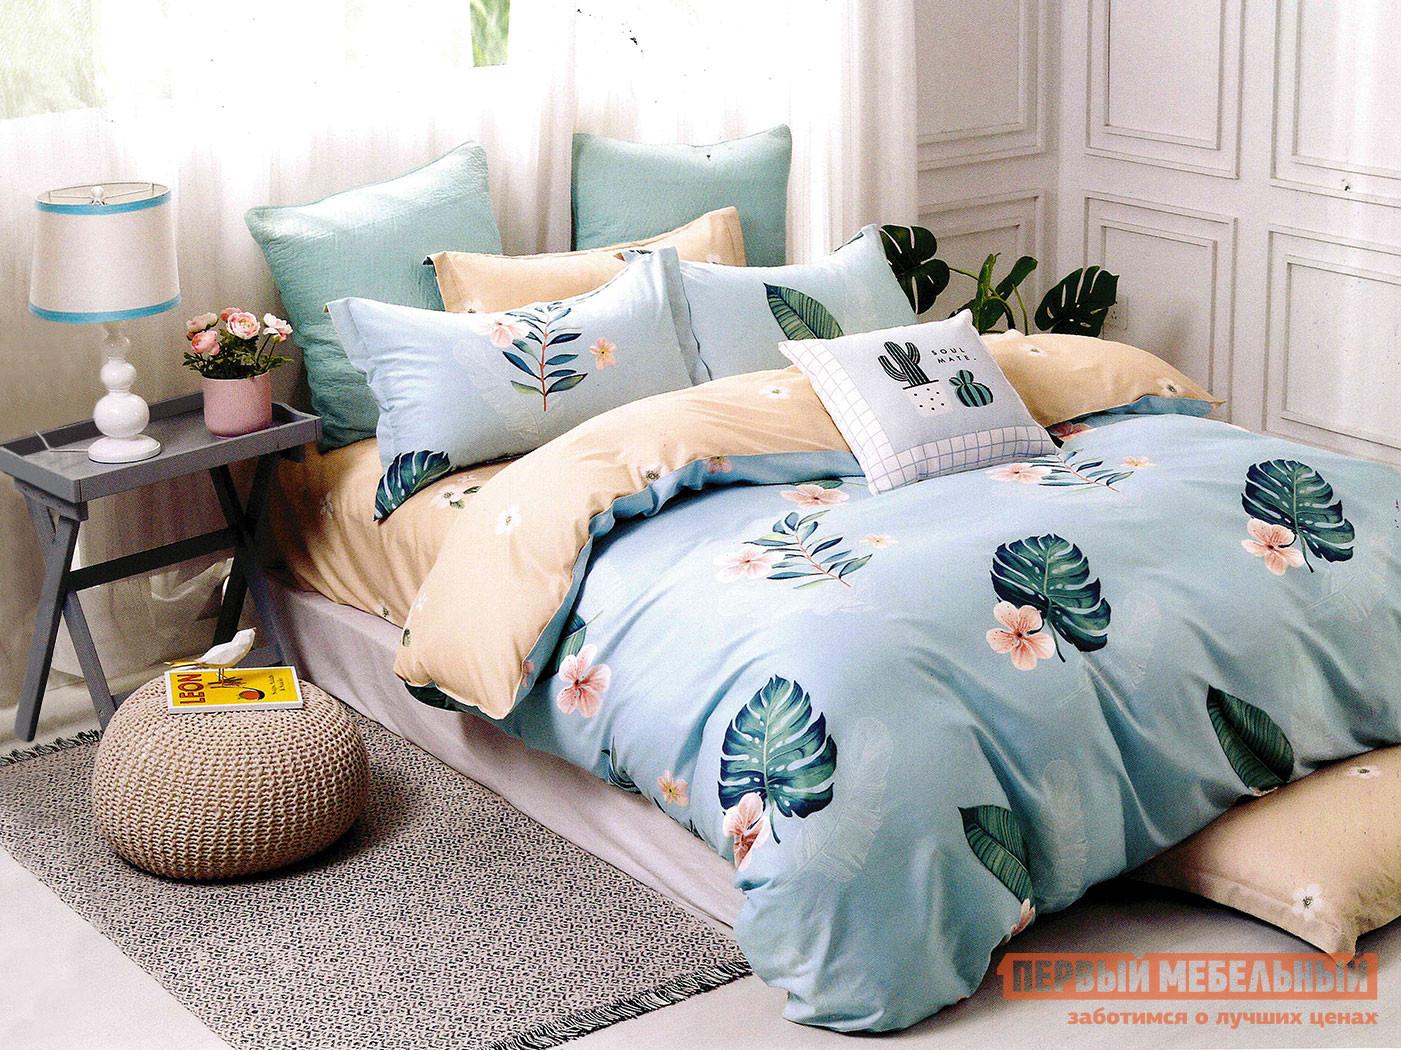 Комплект постельного белья КПБ Butterfly Сатин 3012 3012, сатин, Евро фото